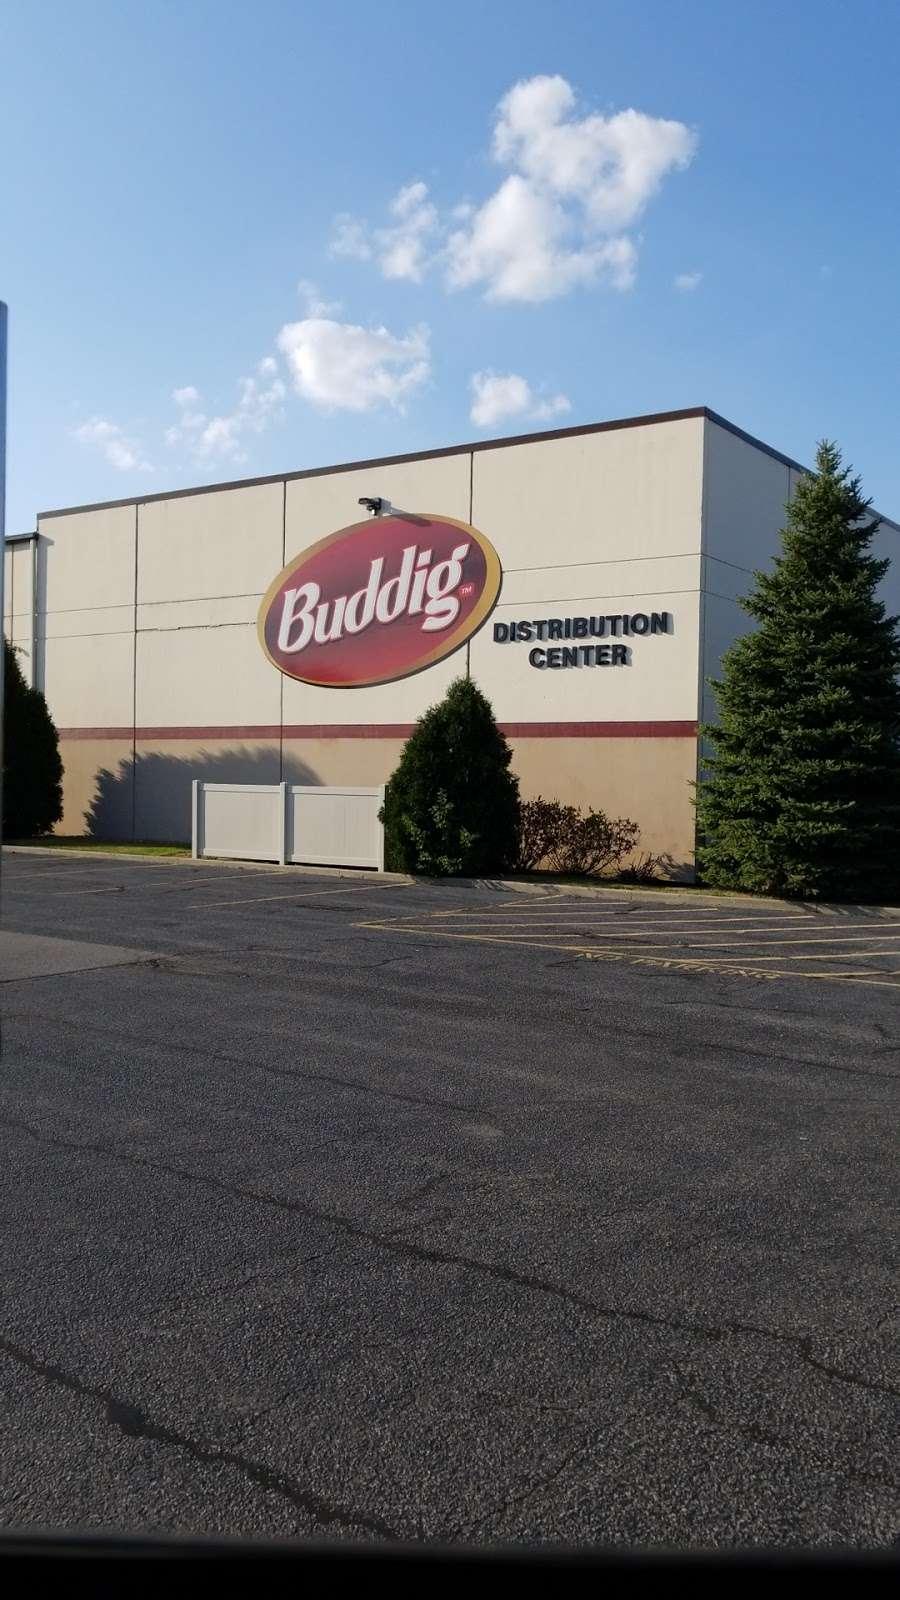 Carl Buddig Company - storage  | Photo 2 of 5 | Address: 215 45th St, Munster, IN 46321, USA | Phone: (708) 210-3130